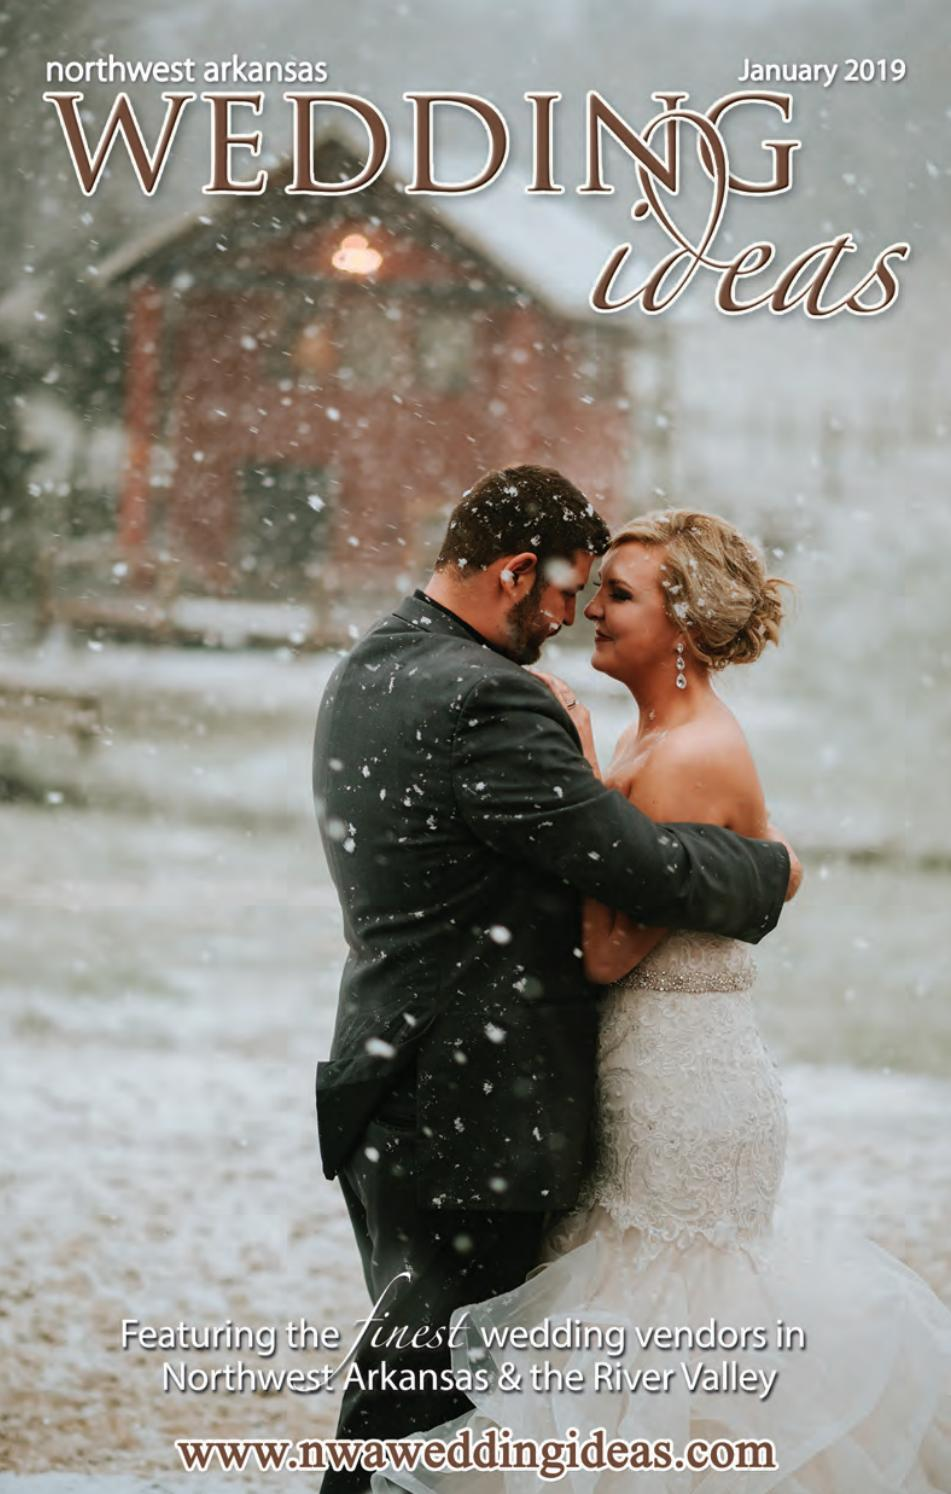 NW Arkansas Wedding Ideas - January